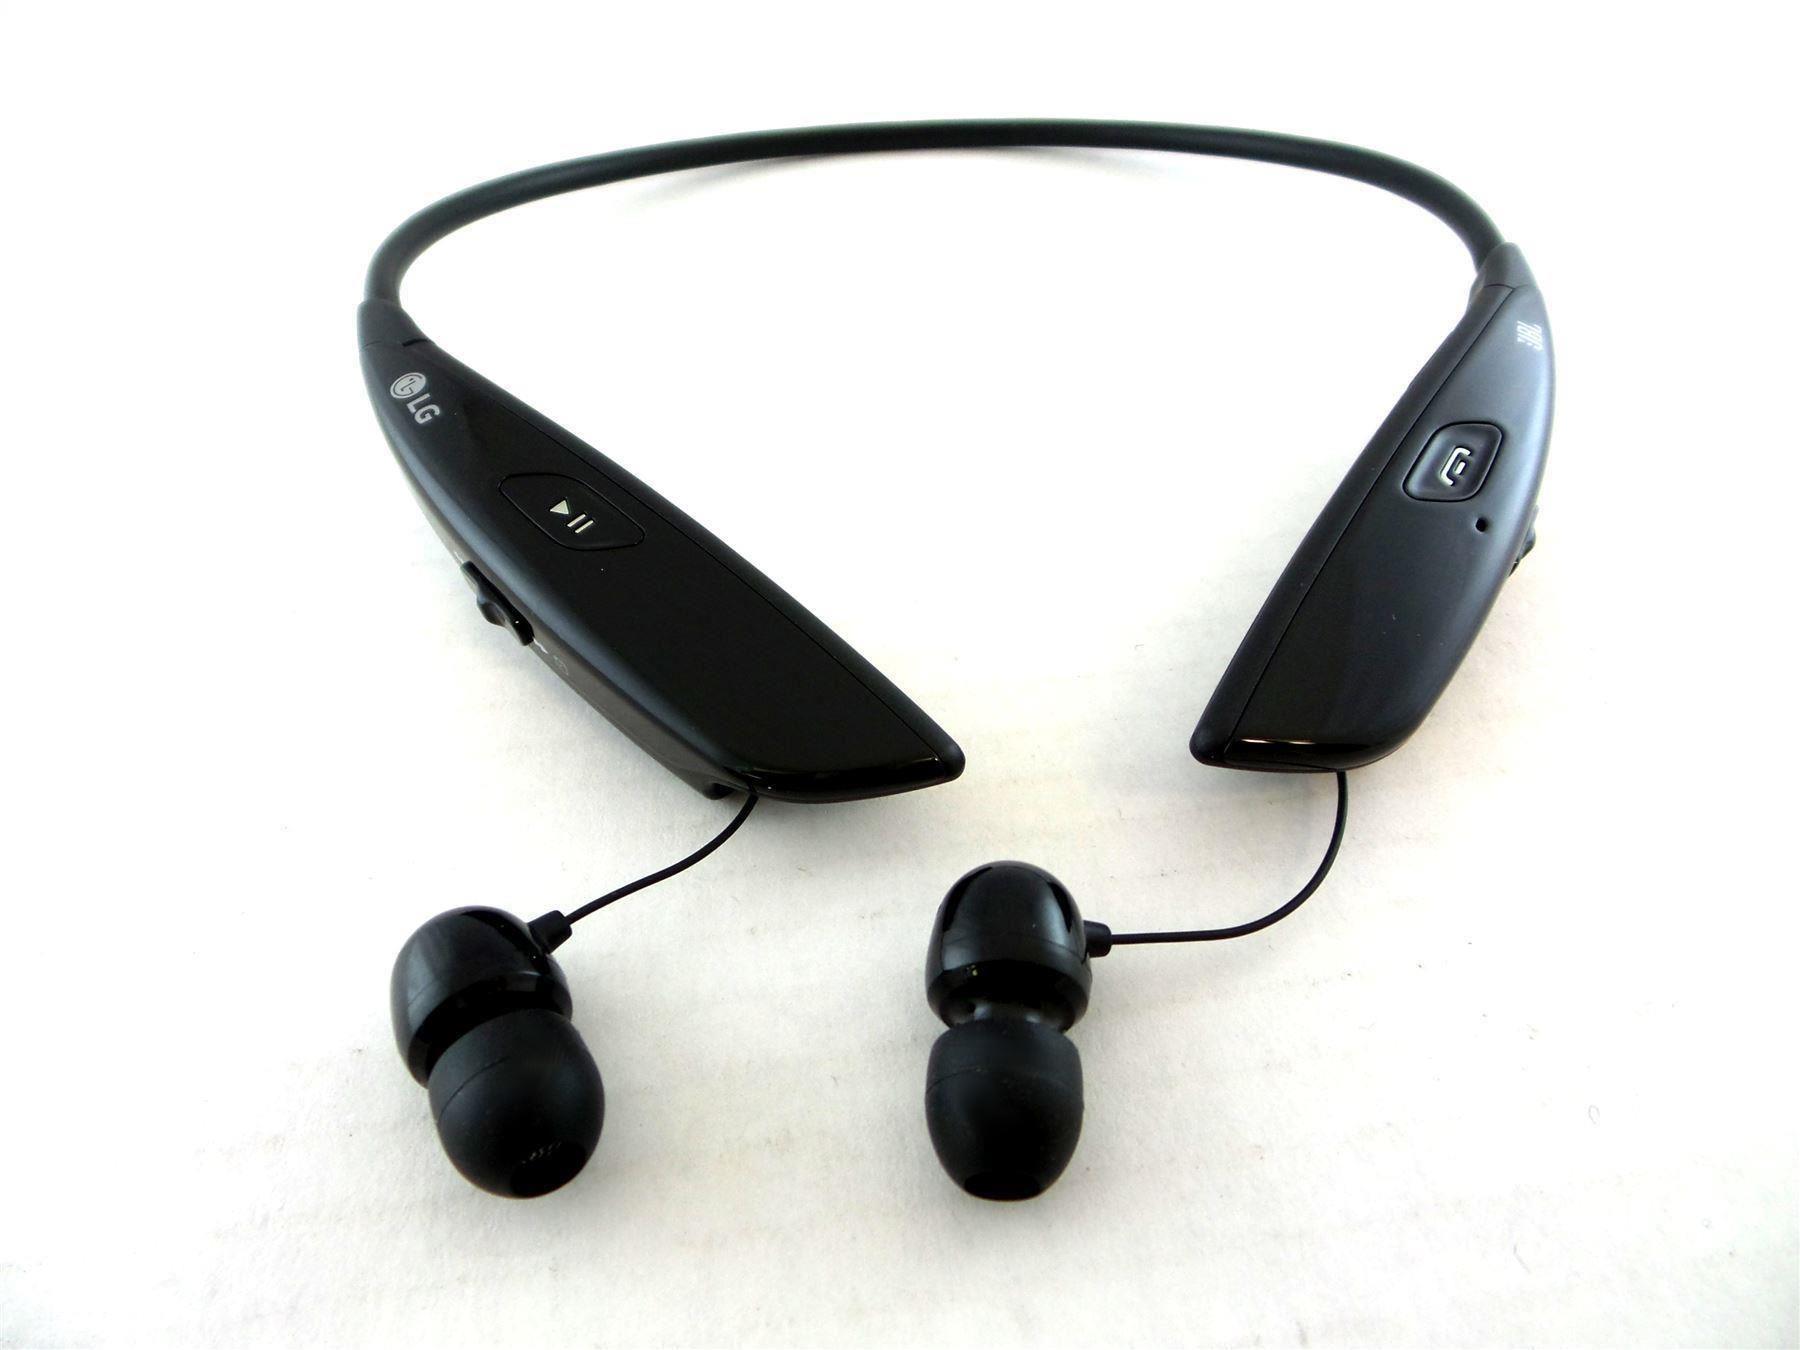 Lg bluetooth headphones wireless 810 - bluetooth headphones gold wireless